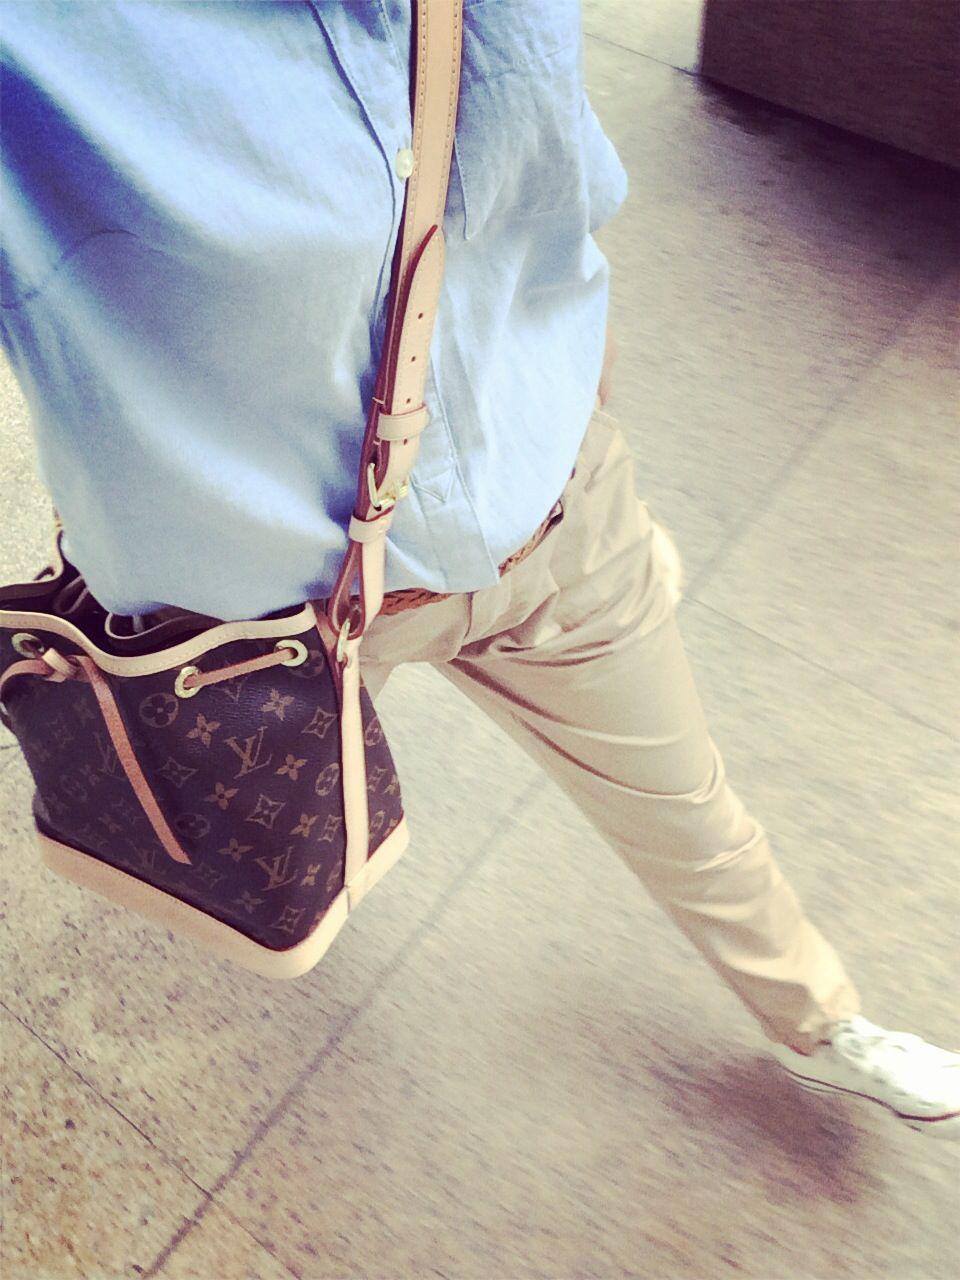 Lv Noe Bb Louis Vuitton Vuitton Outfit Louis Vuitton Noe Bb